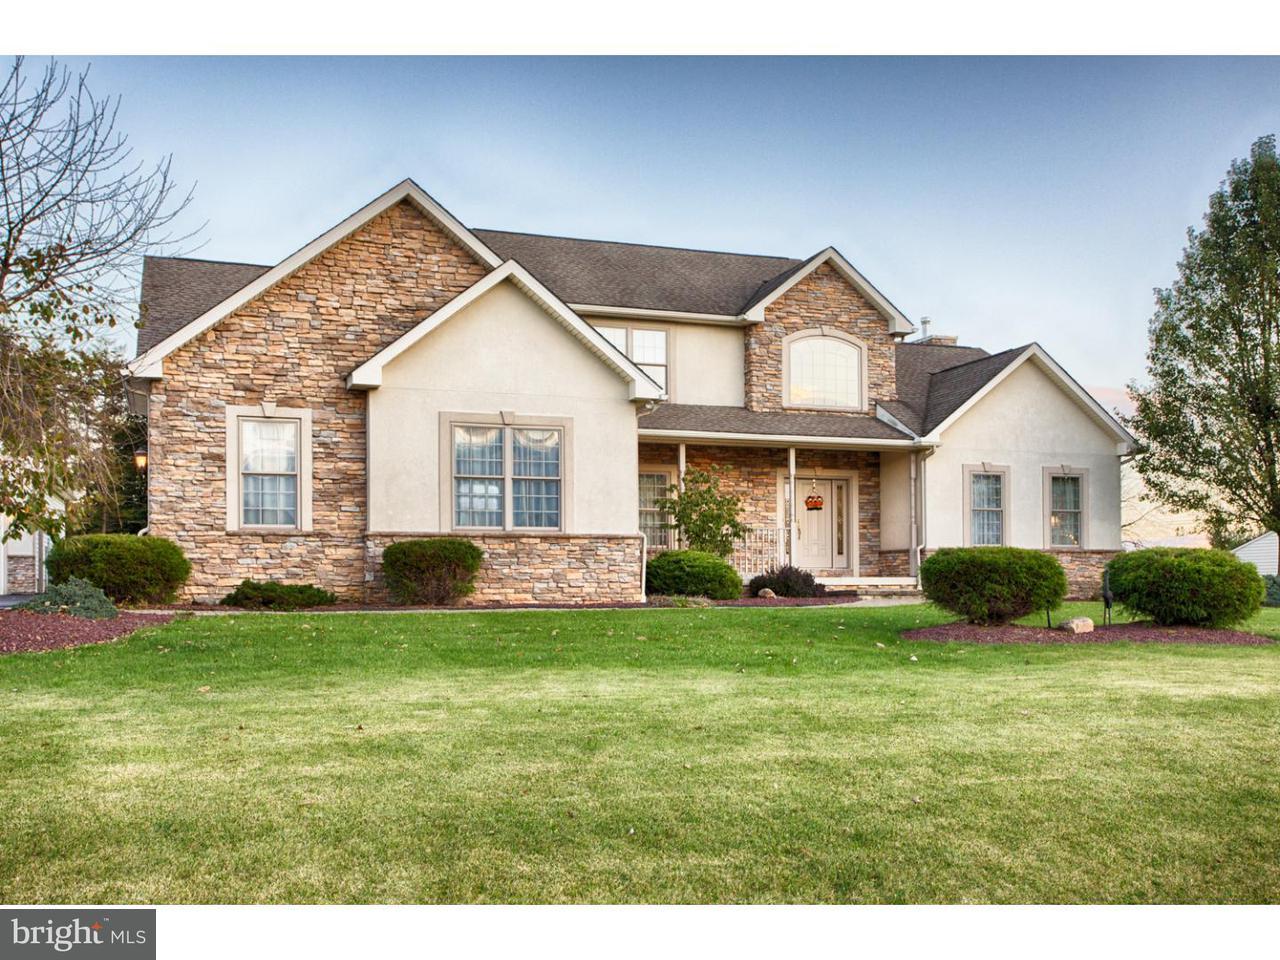 Single Family Home for Sale at 206 BUSHKILL TER Nazareth, Pennsylvania 18064 United States